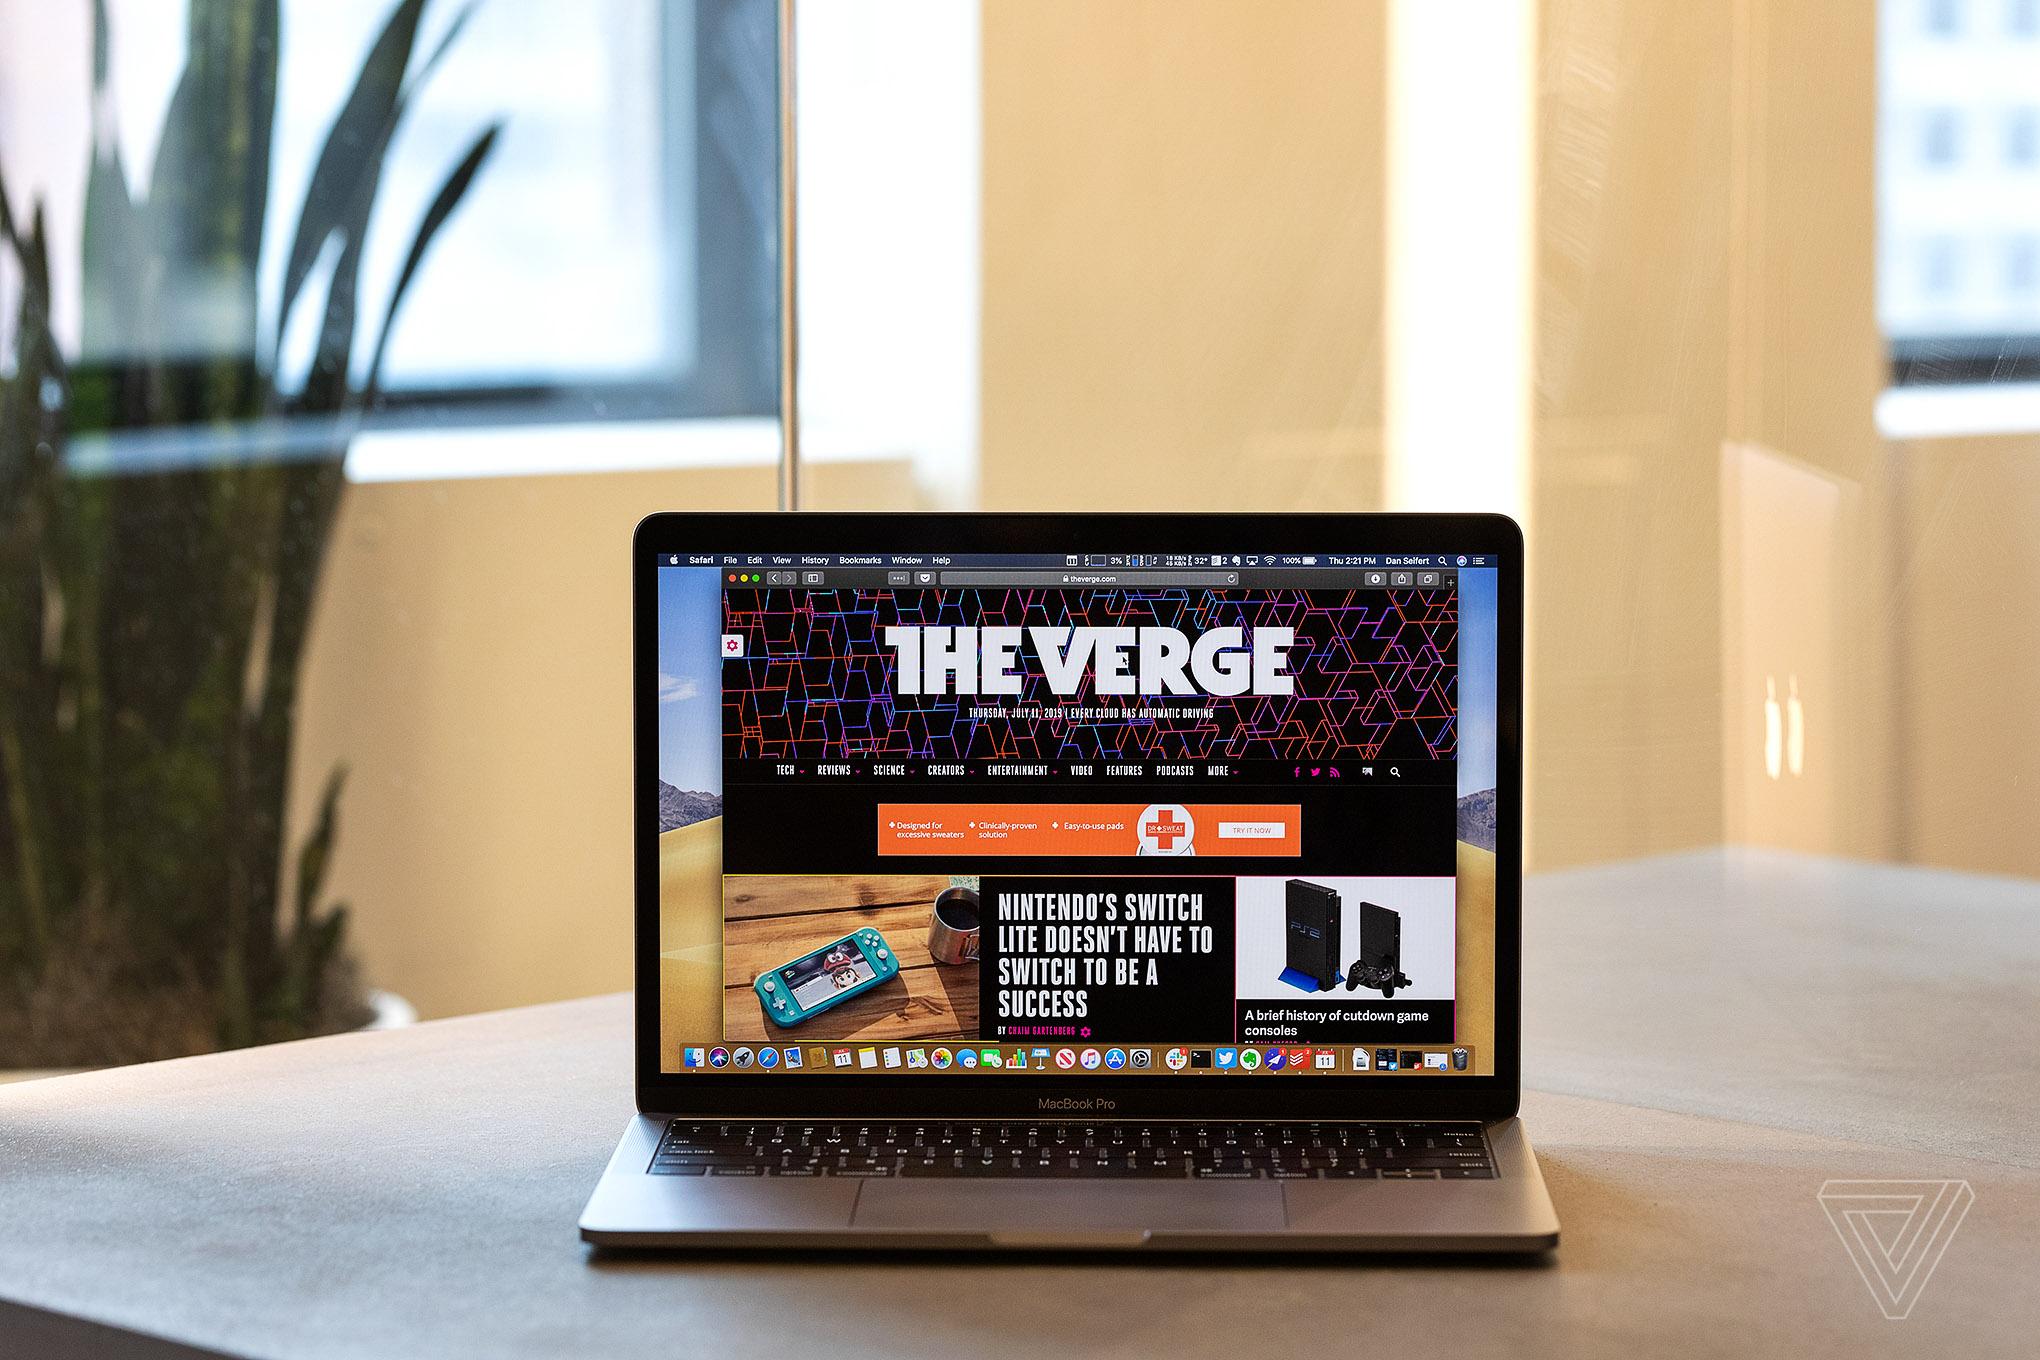 Laptop Reviews - The Verge